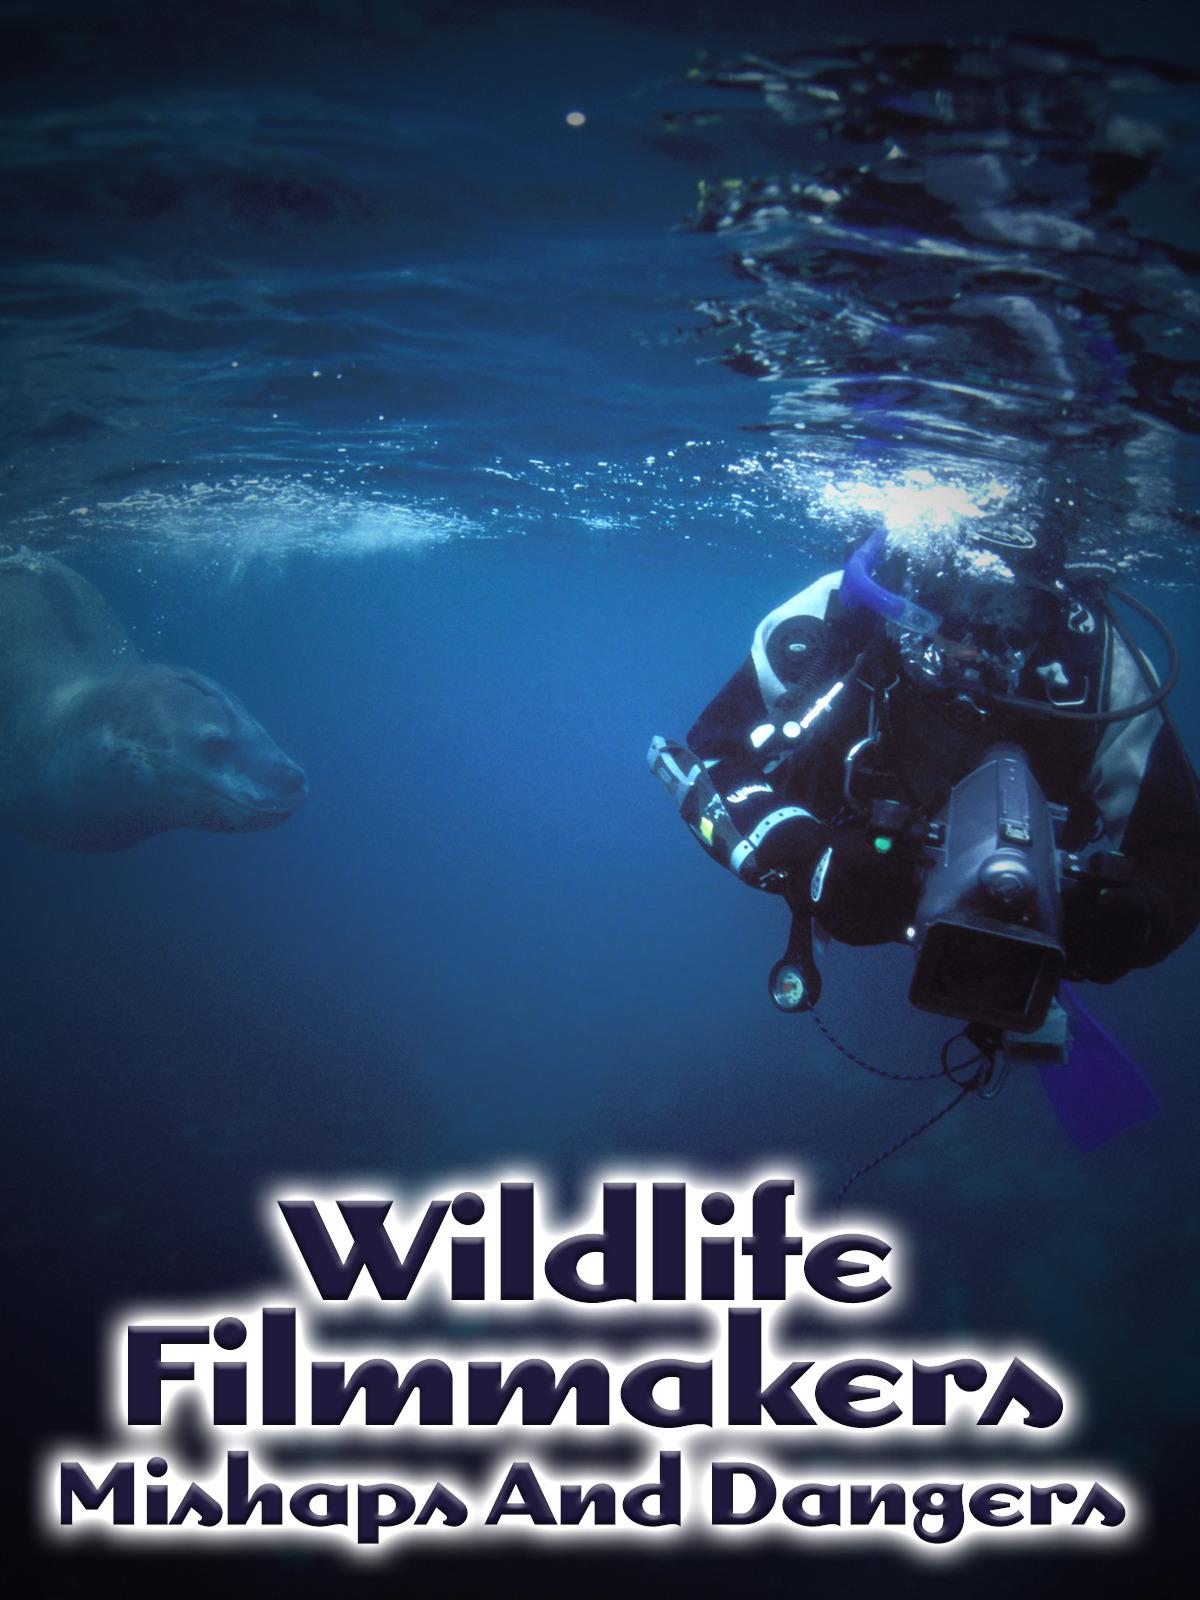 Prime Video: Wildlife Filmmakers - Mishaps And Dangers